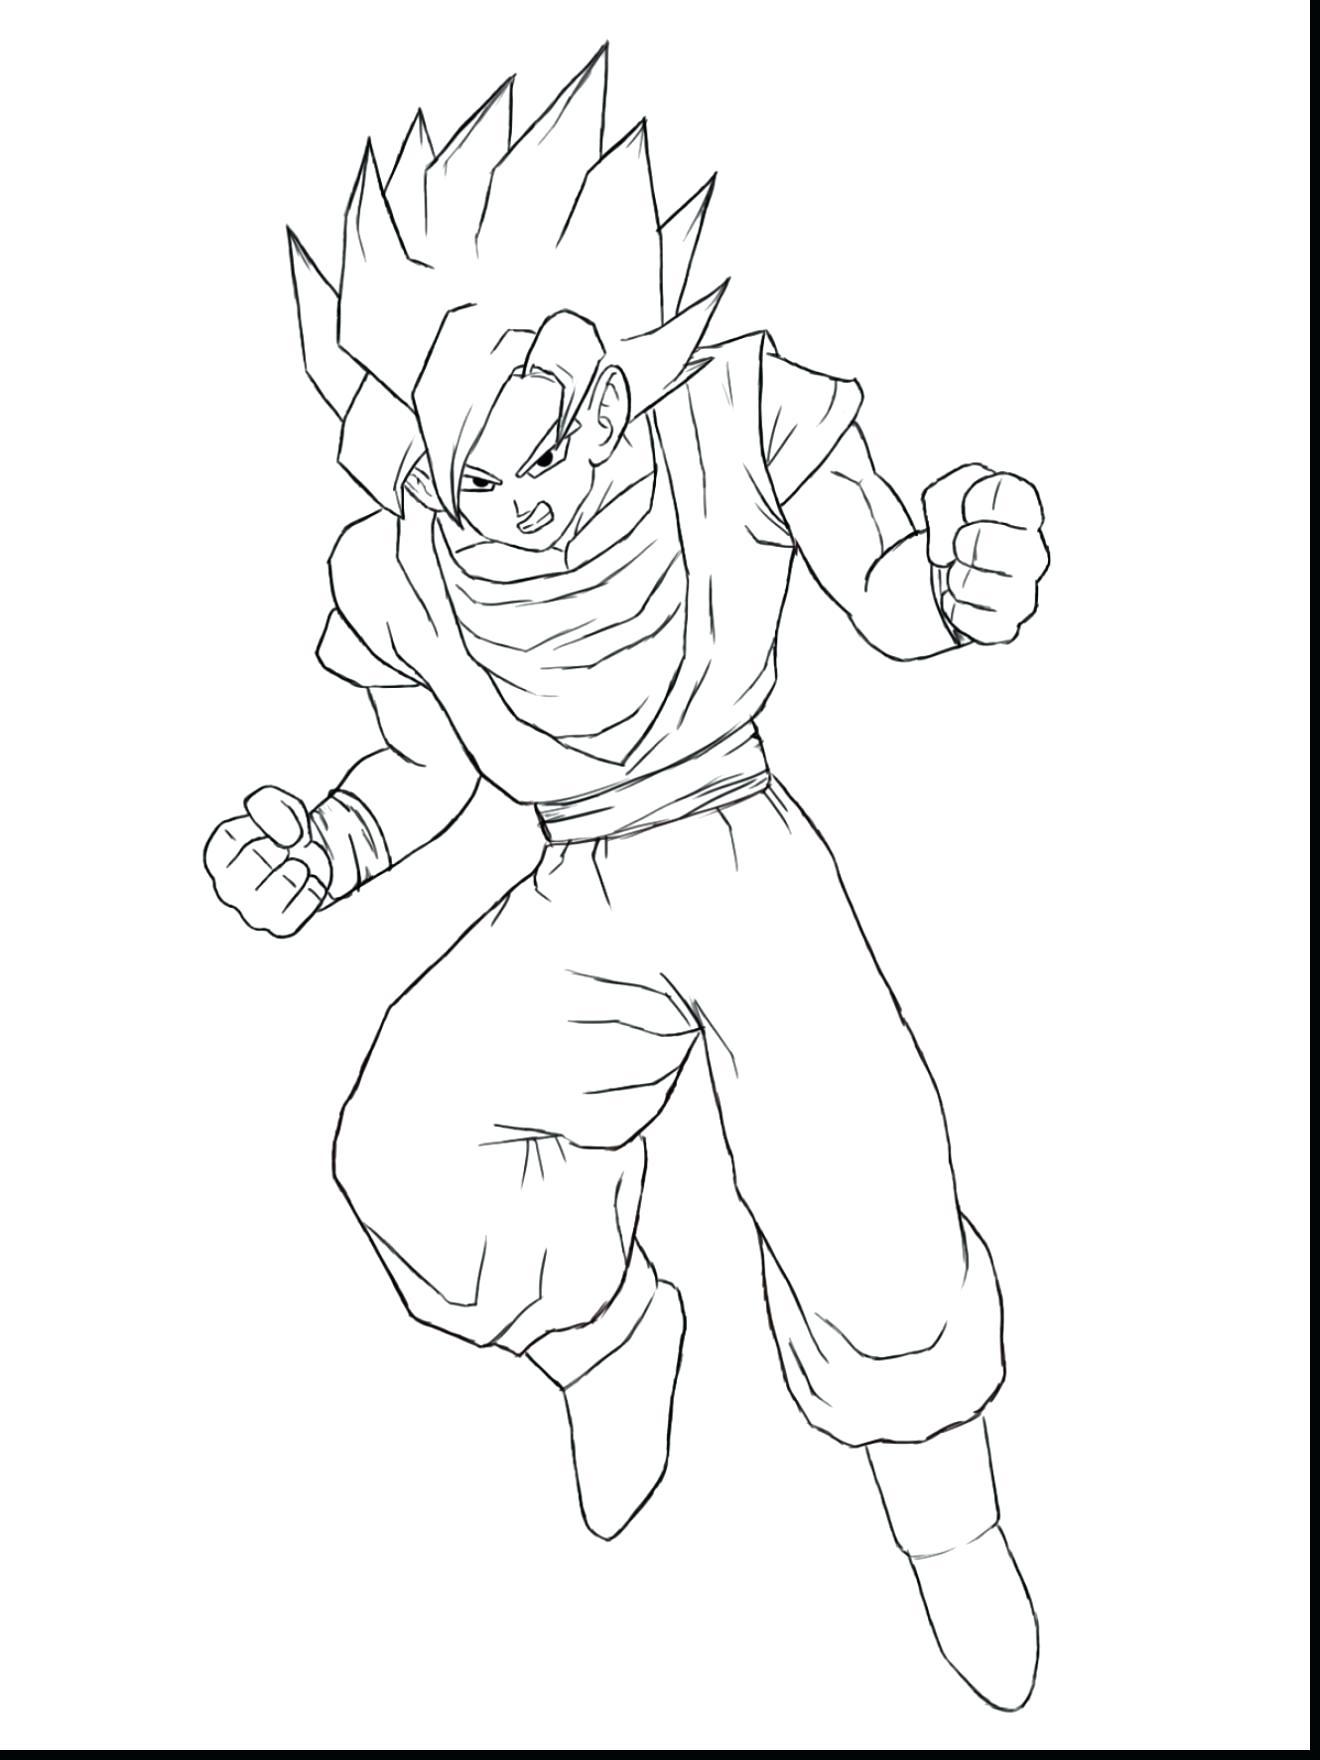 Goku Vs Vegeta Coloring Pages Novocom Top